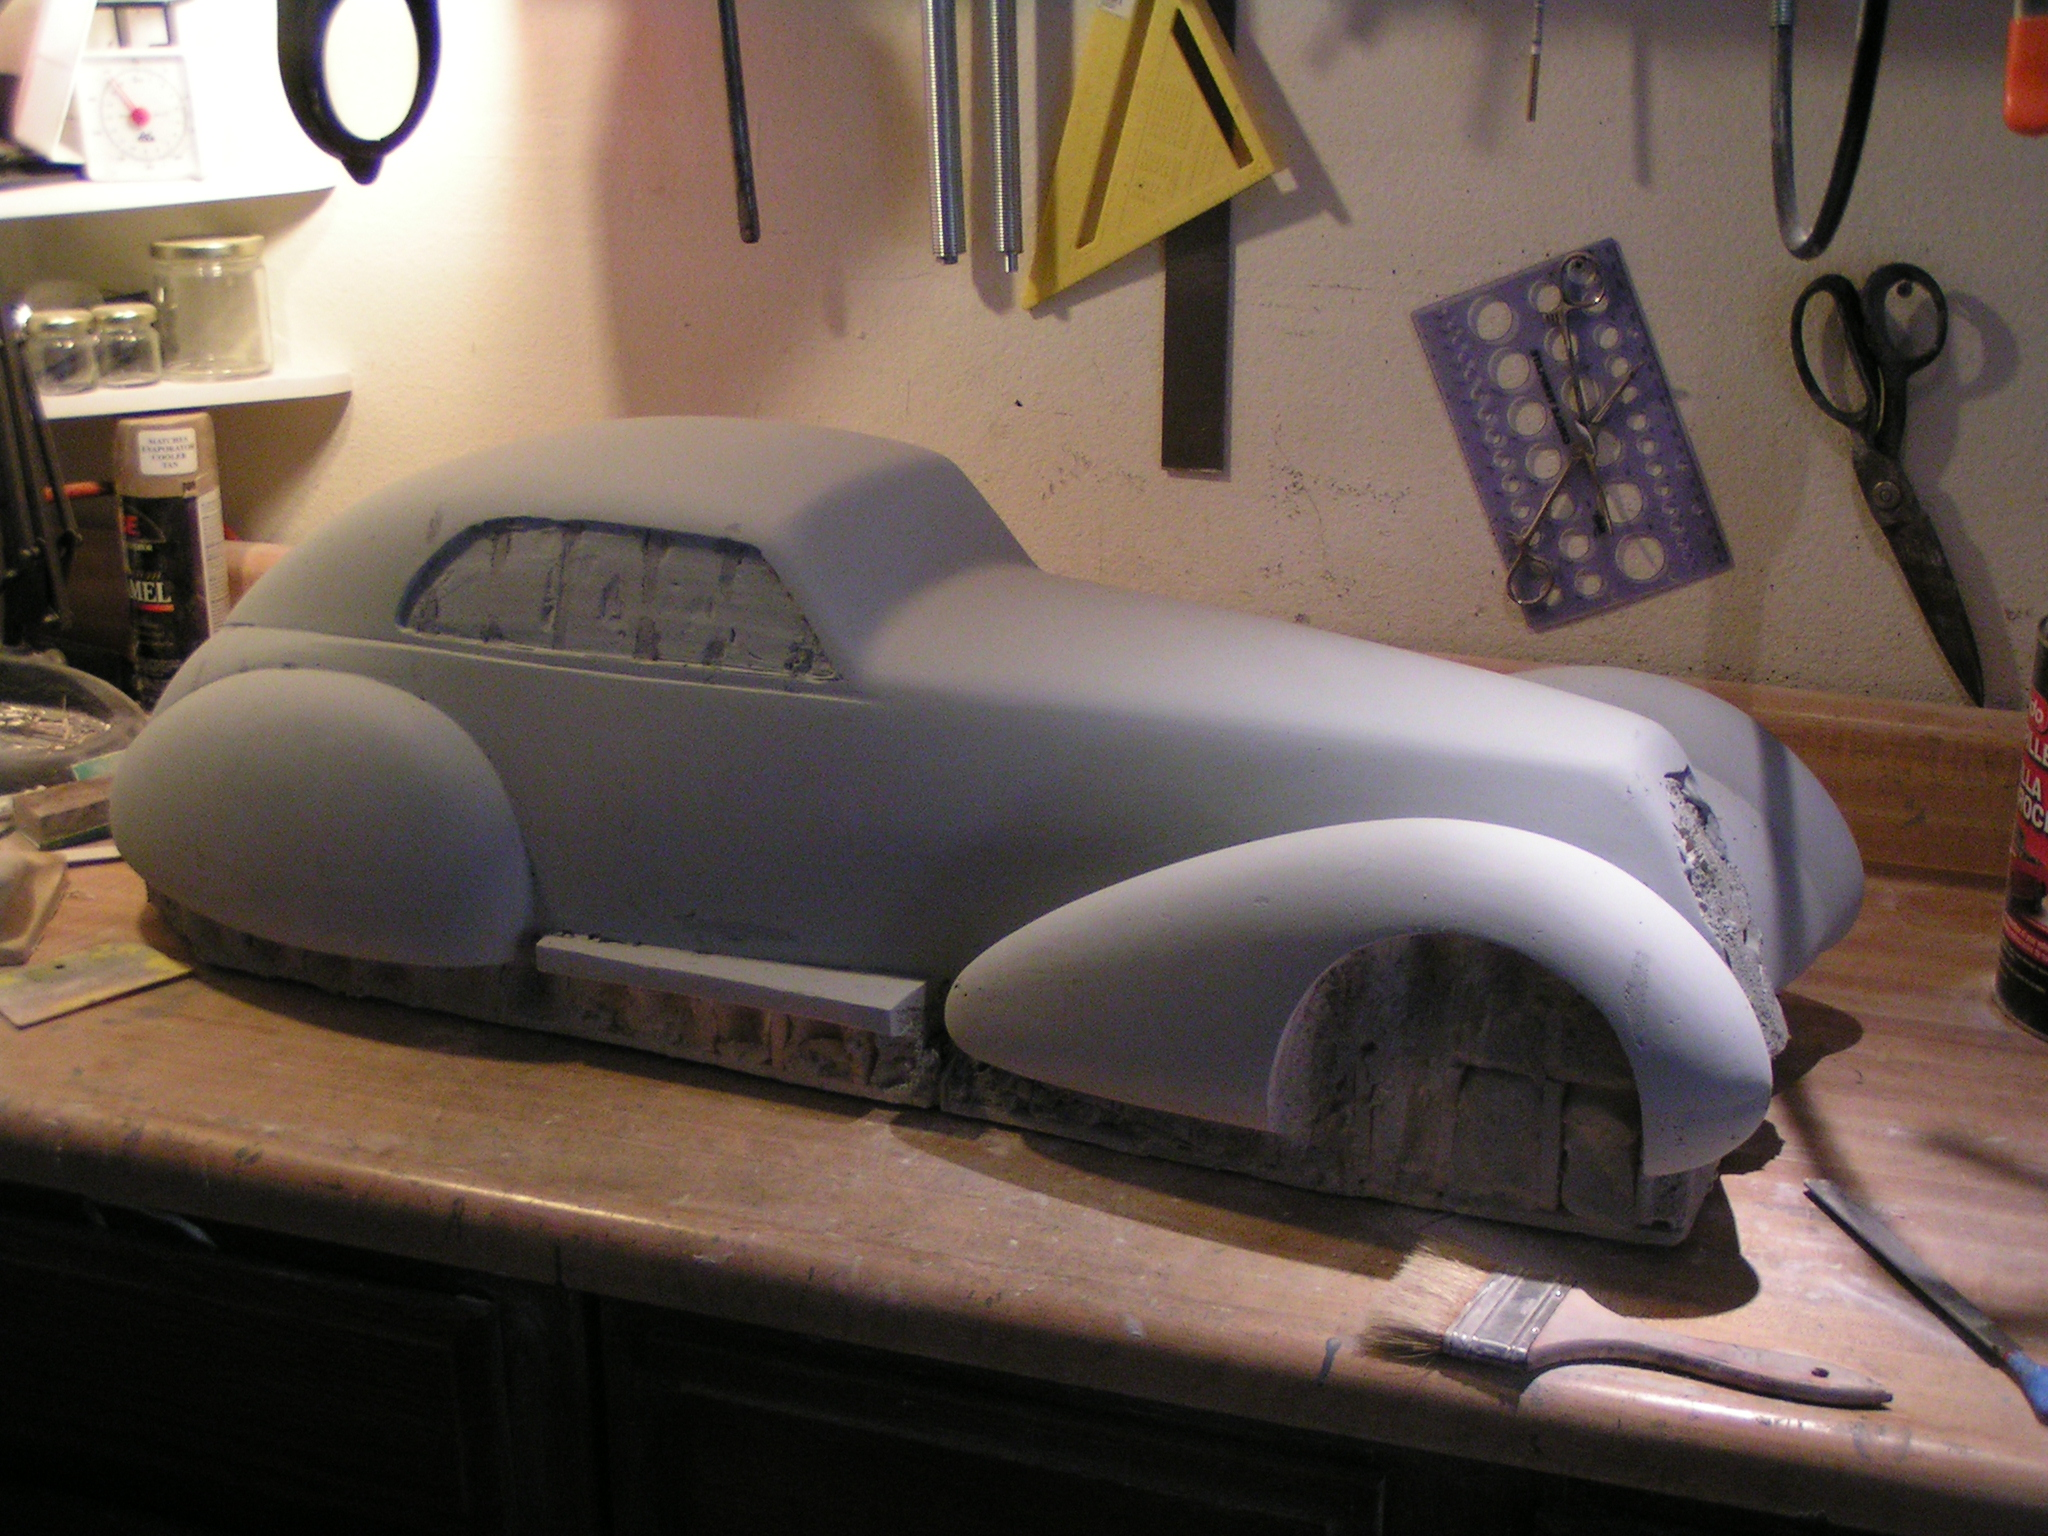 Alfa scale model mold body shape